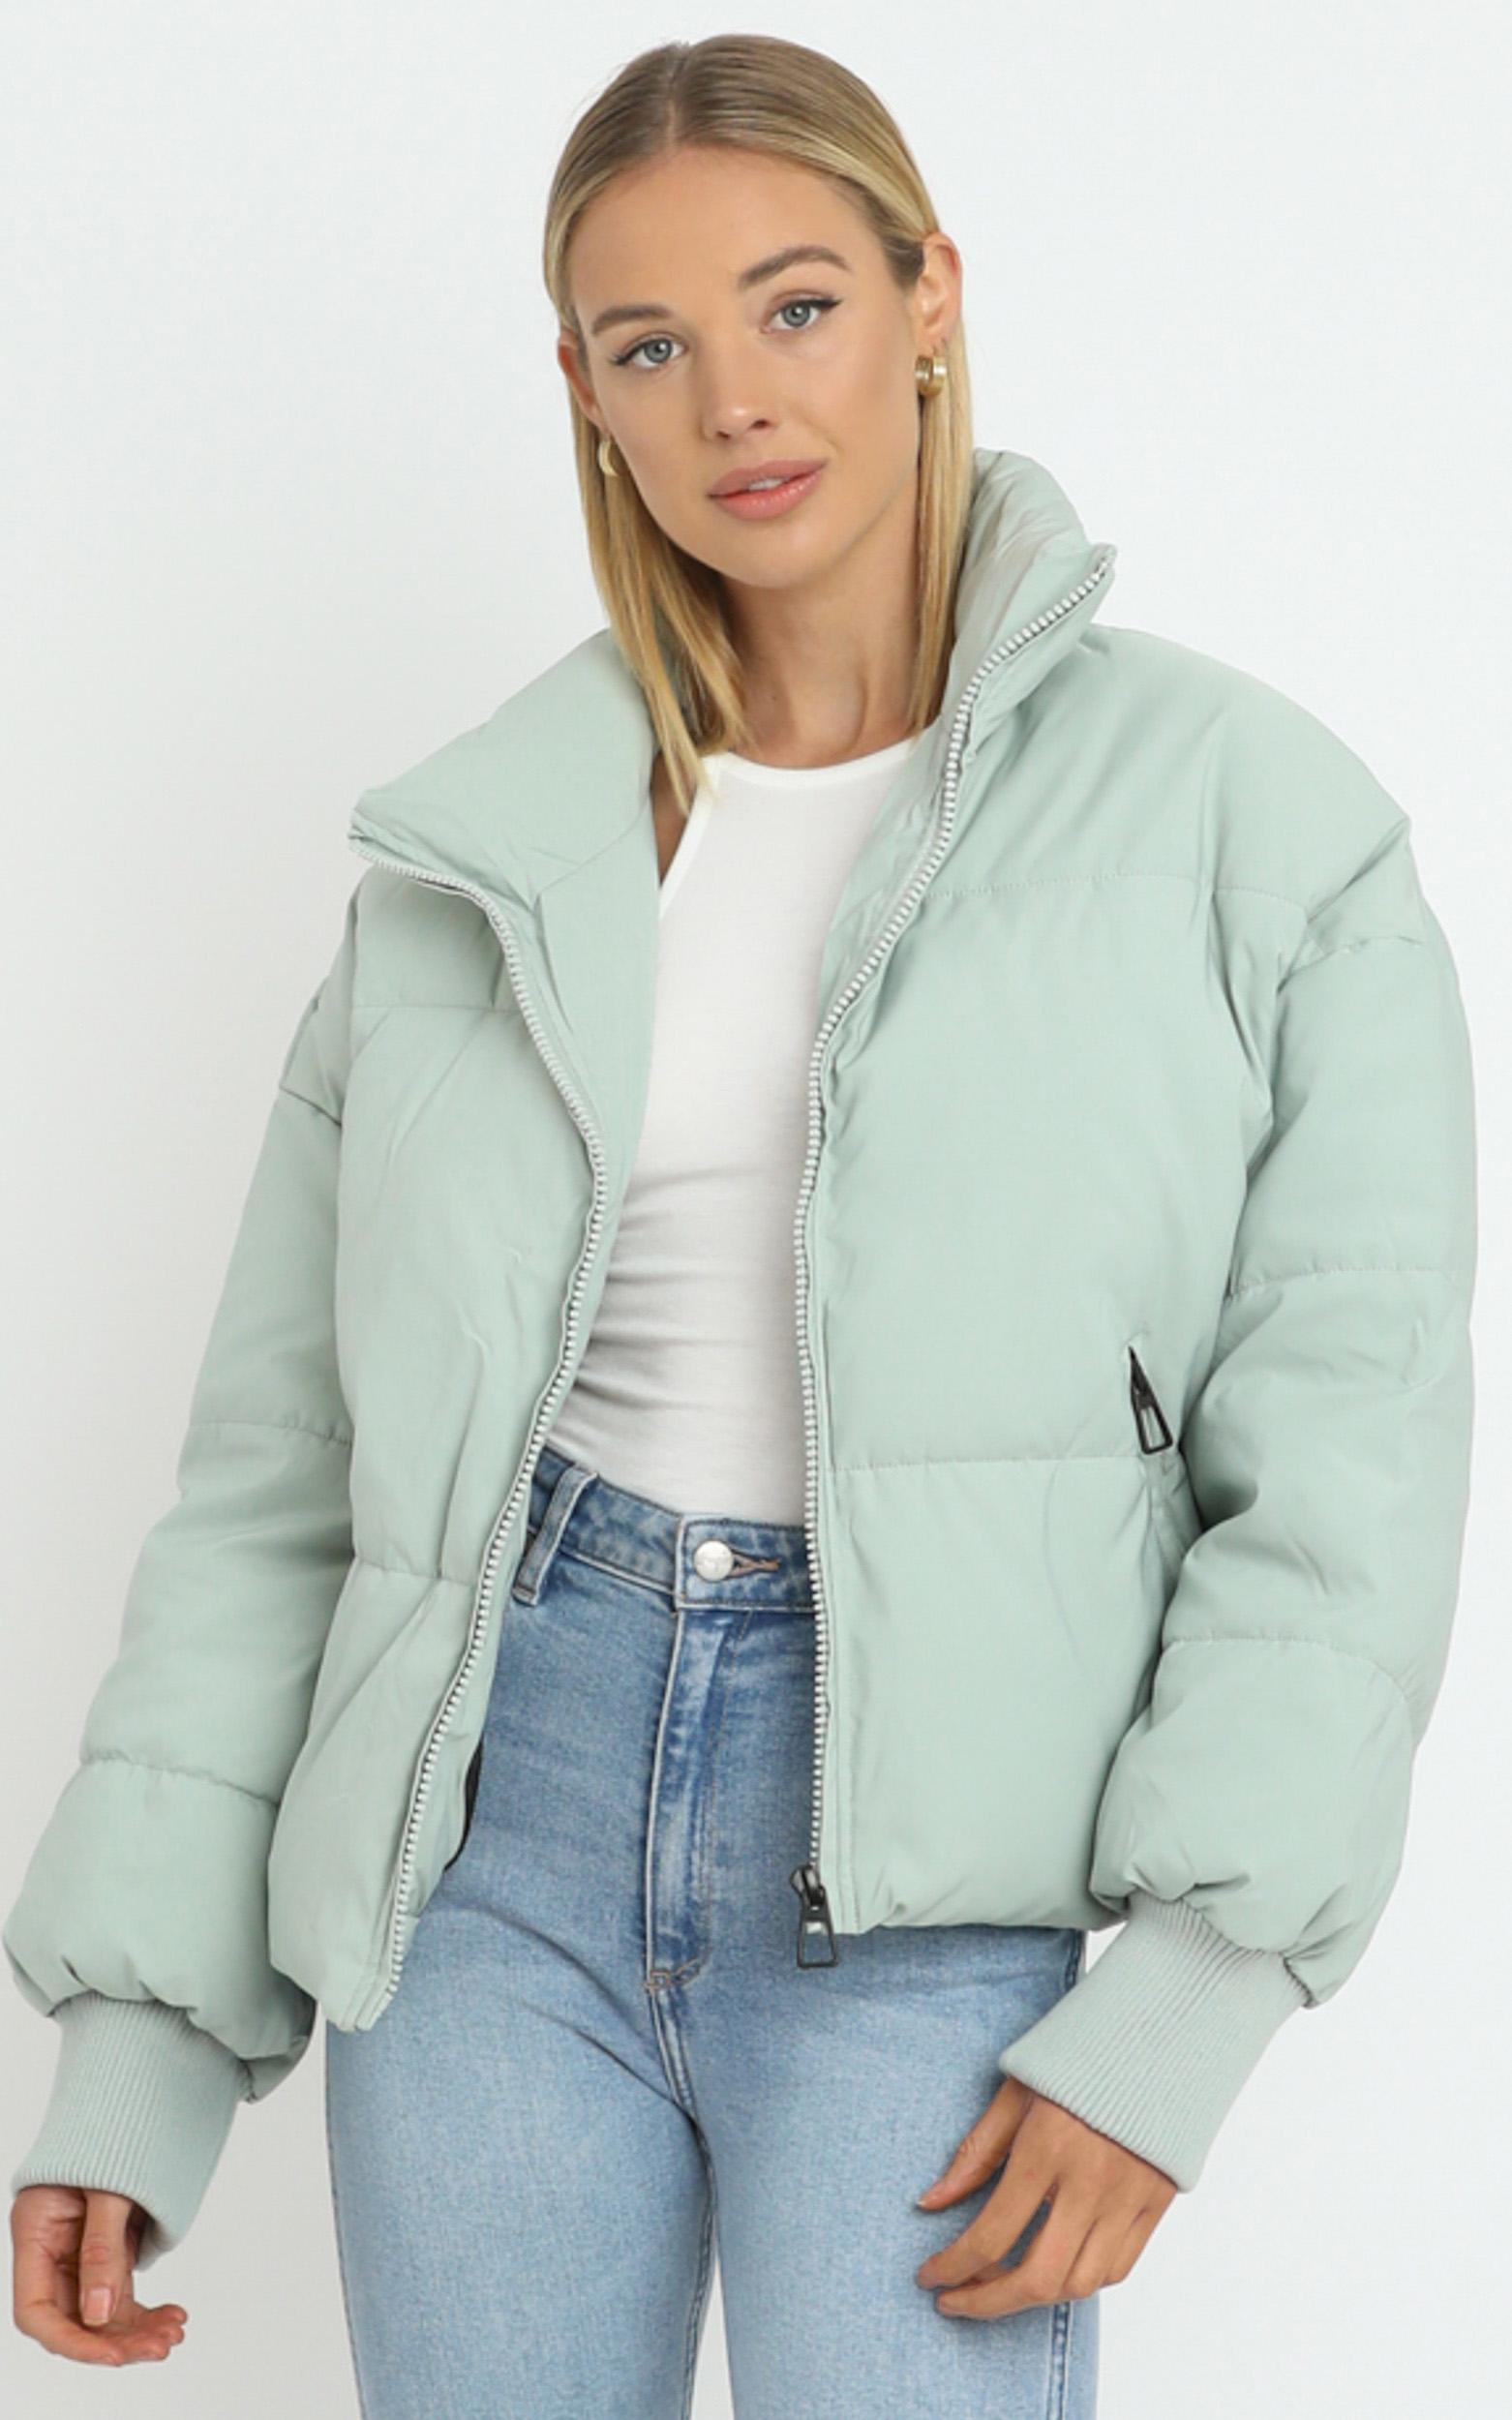 Windsor Puffer Jacket in Khaki - 06, GRN3, hi-res image number null